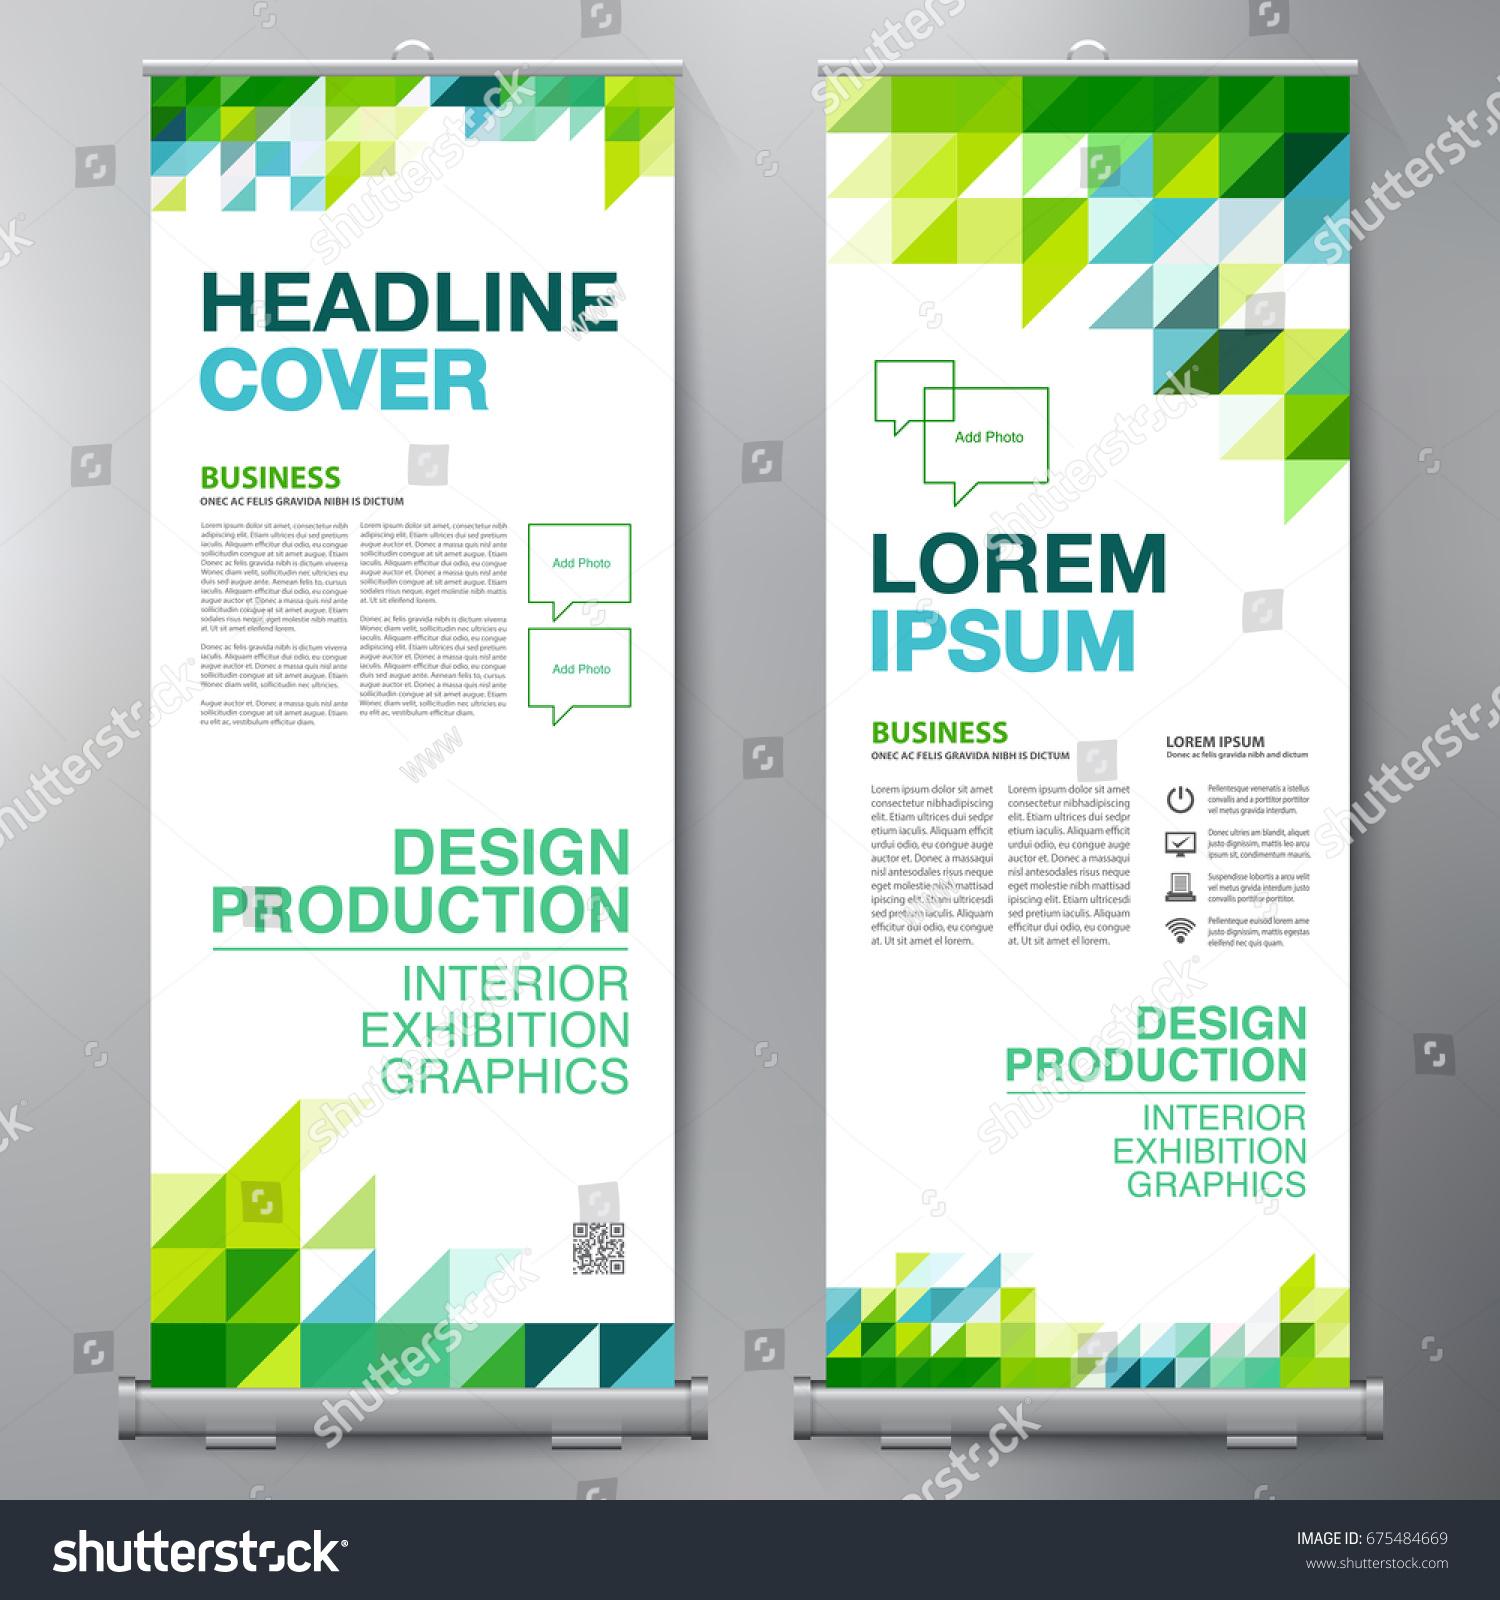 Design banner template - Business Roll Up Standee Design Banner Template Presentation And Brochure Flyer Vector